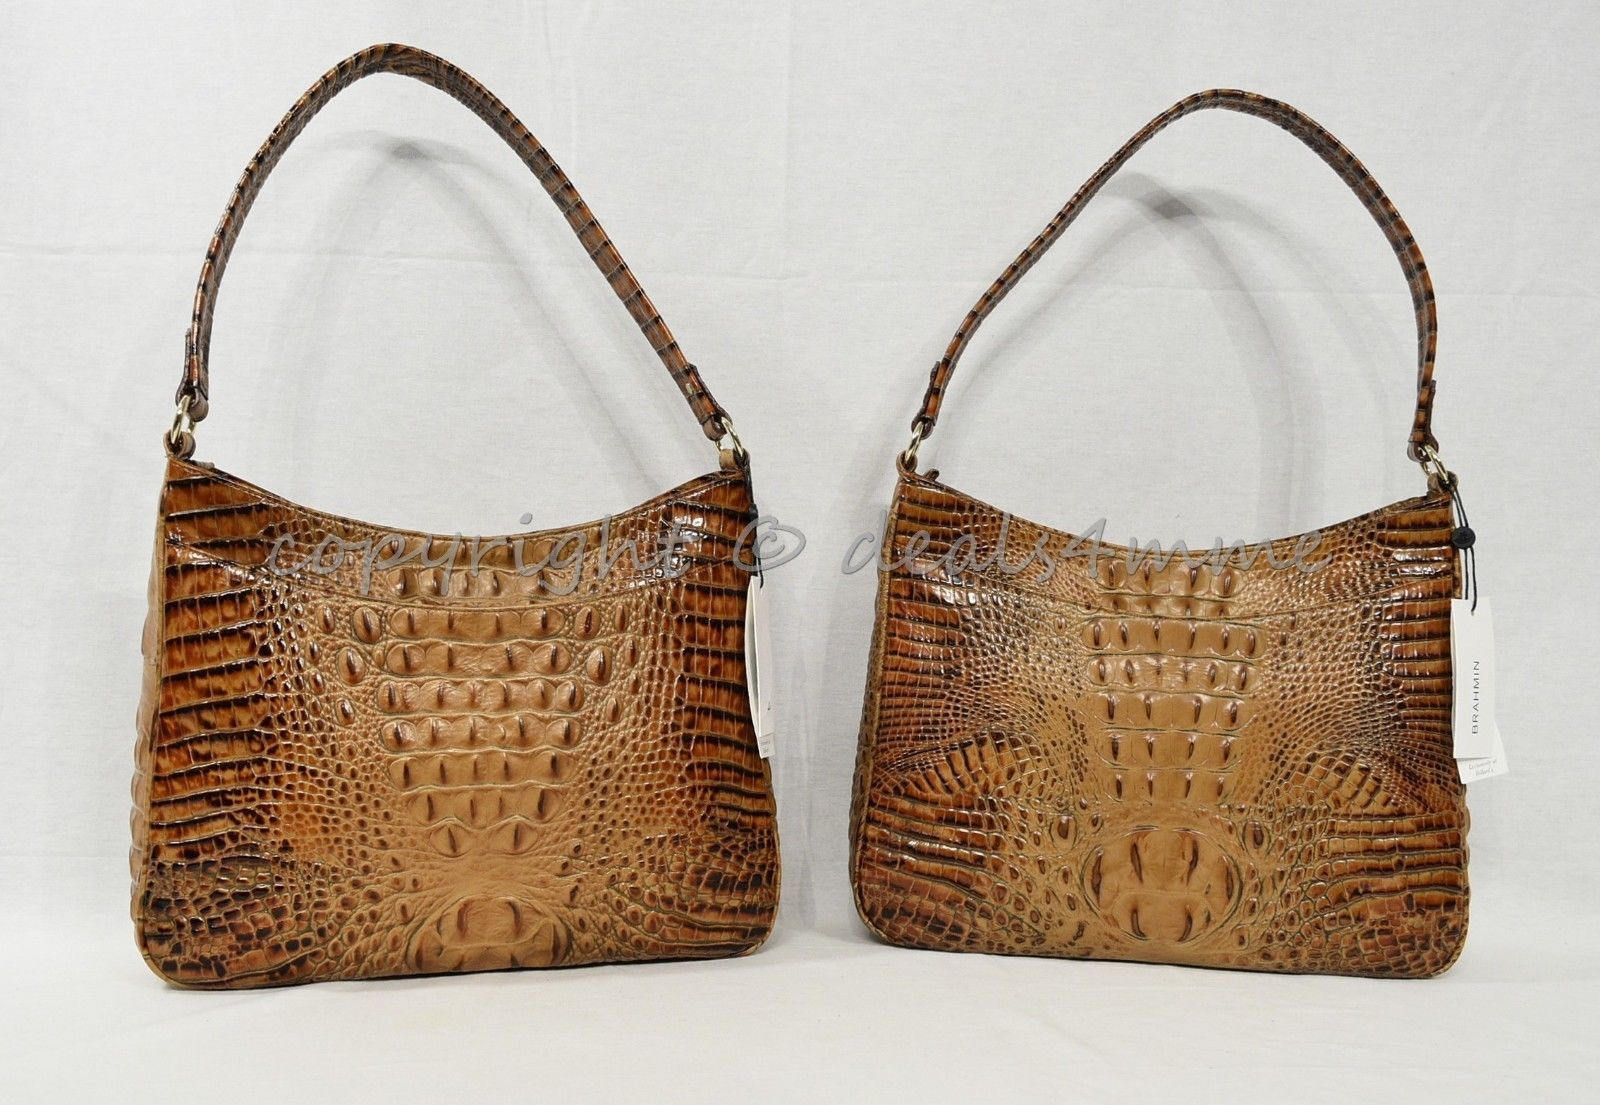 NWT Brahmin Noelle Leather Tote / Shoulder Bag in Toasted Almond Melbourne image 11